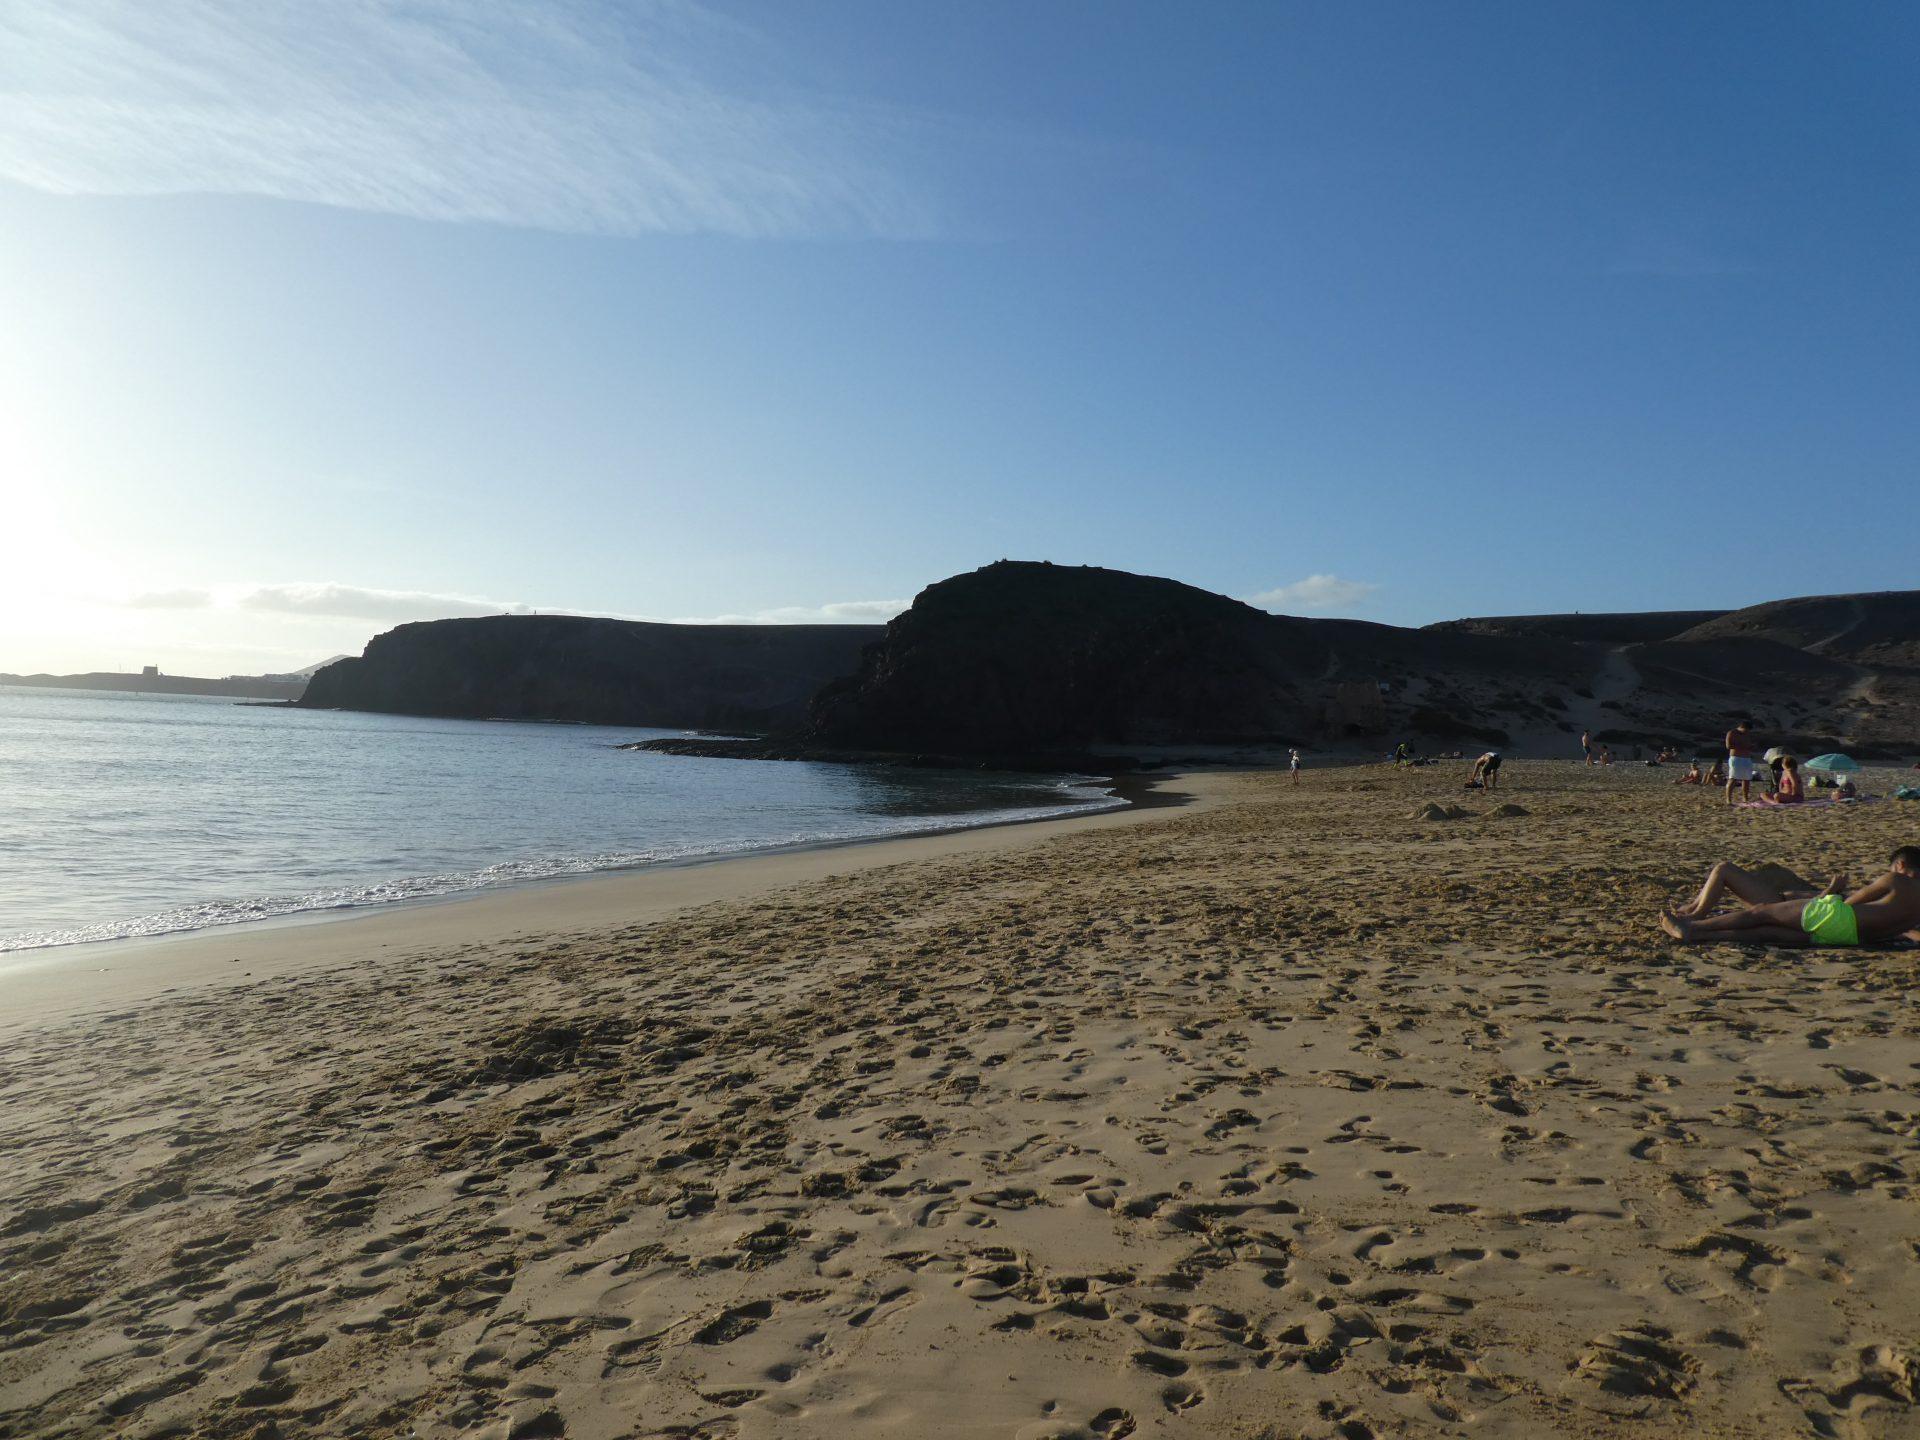 Playa mujeres Lanzarote